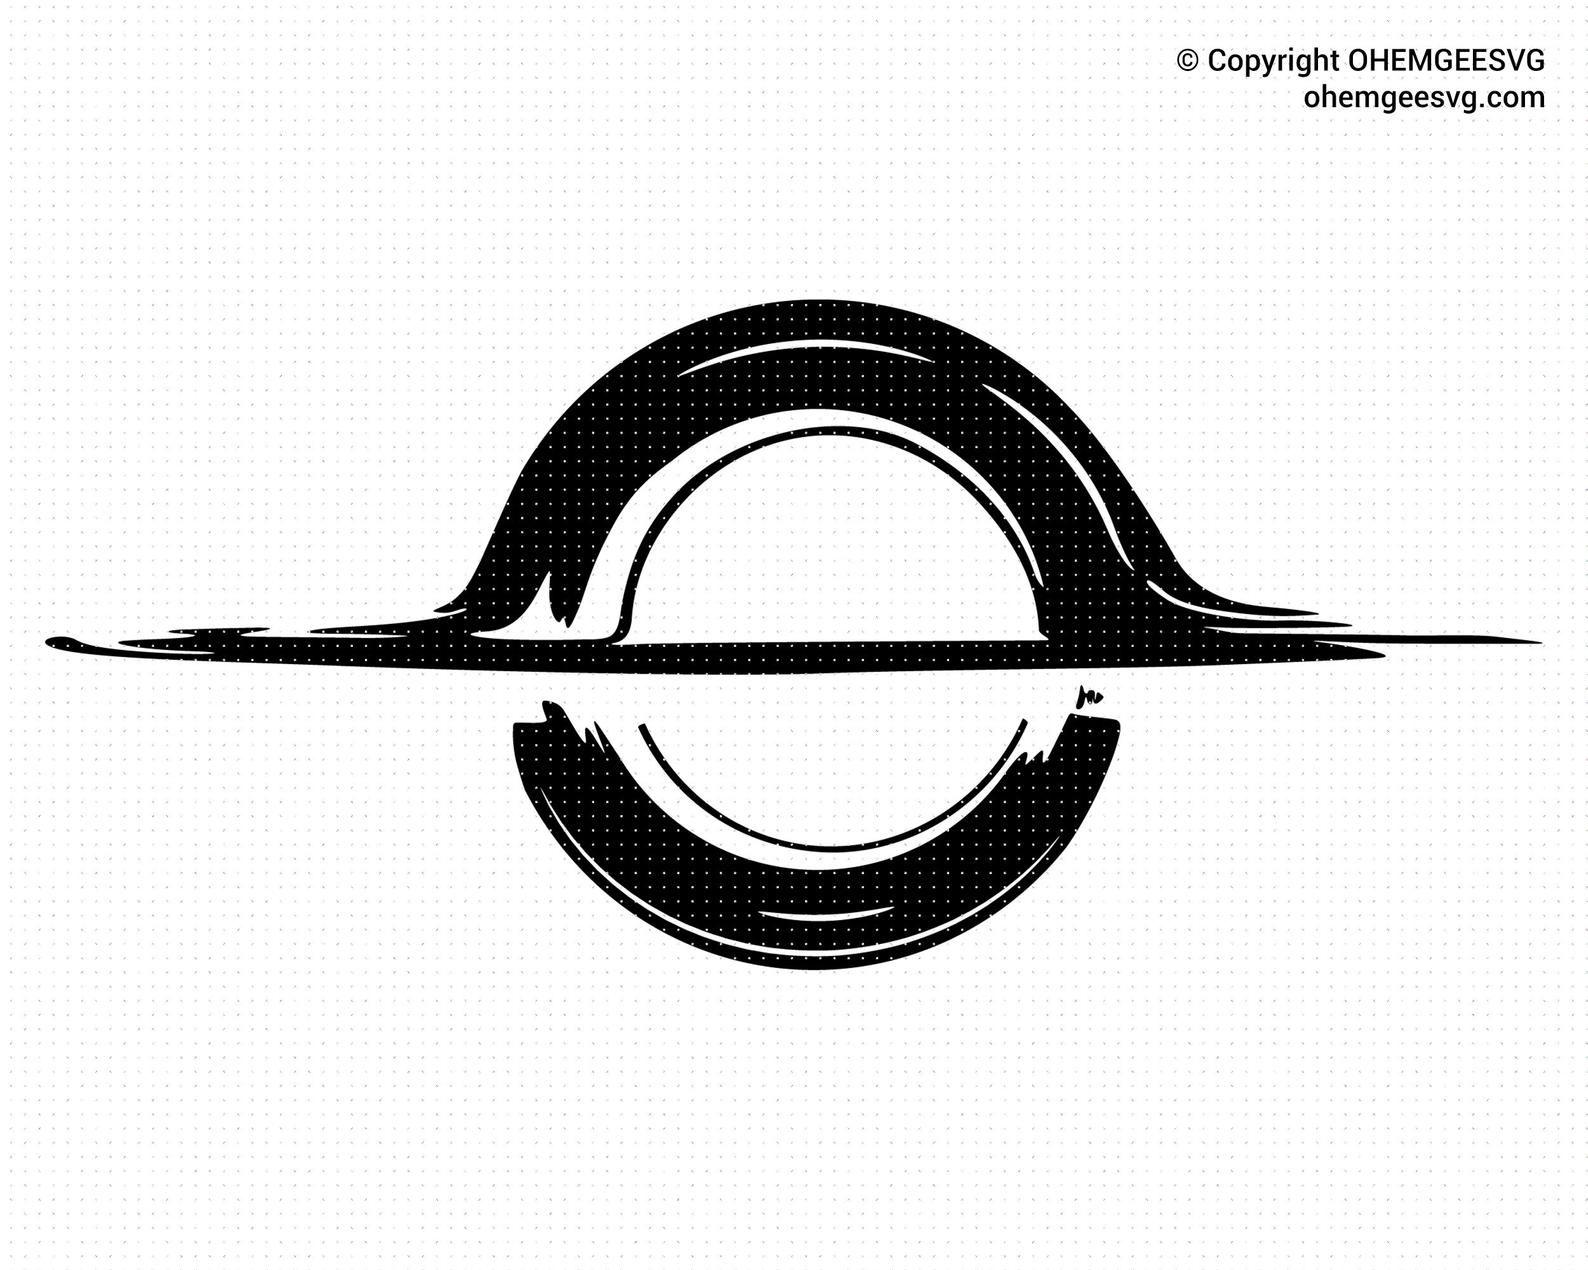 Black Hole SVG Black Hole Silhouette Solar System SVG